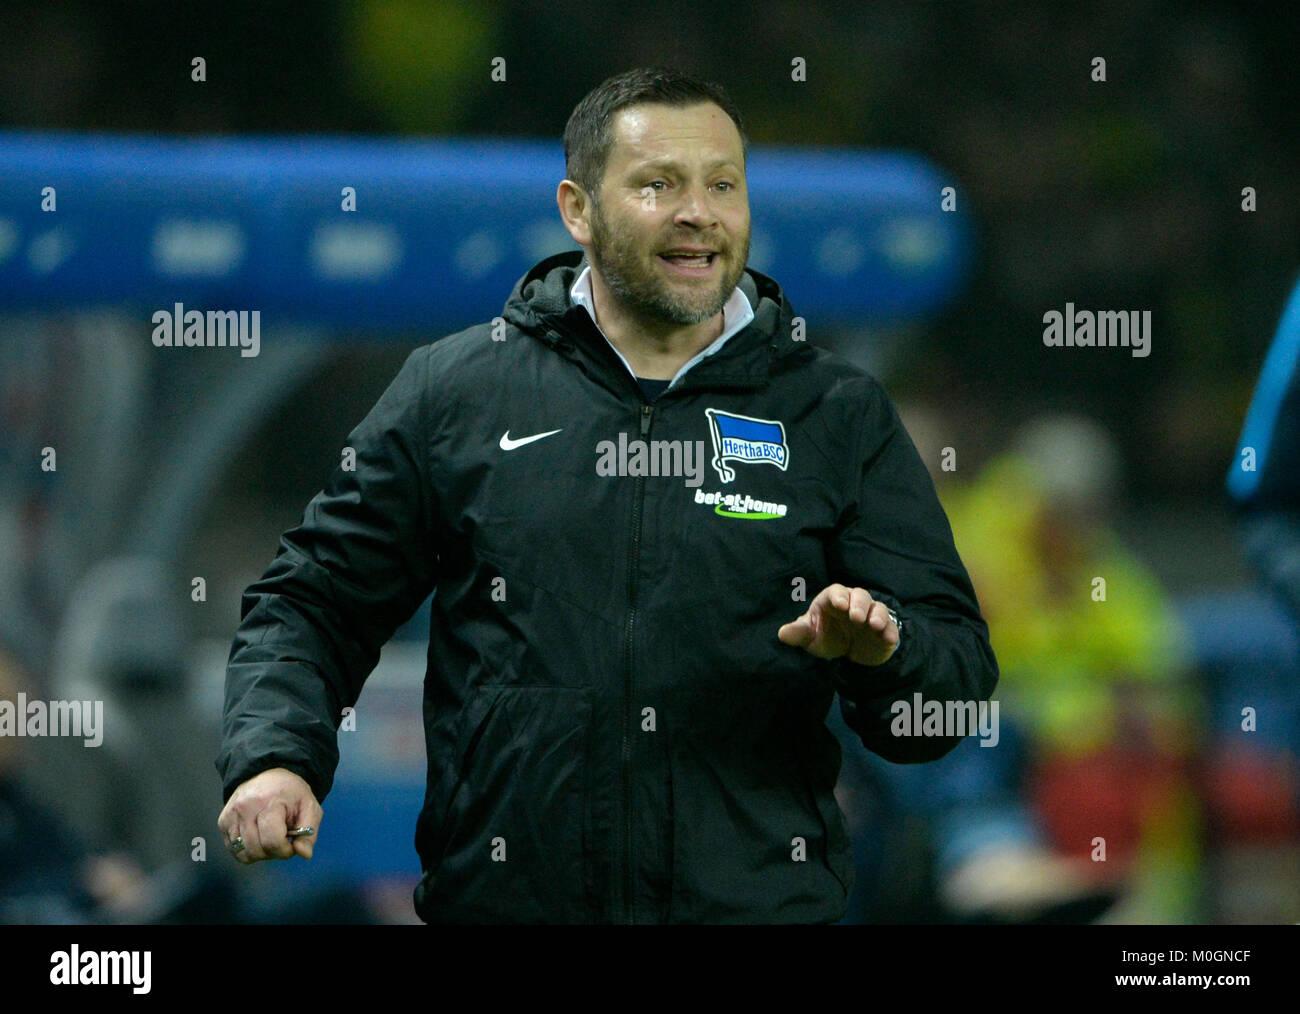 Berlin, Deutschland. 19 Jan, 2018. Trainer Pal DARDAI (B), Geste, Gestik, Fussball 1. 1. Fussballbundesliga, 19. Stockbild